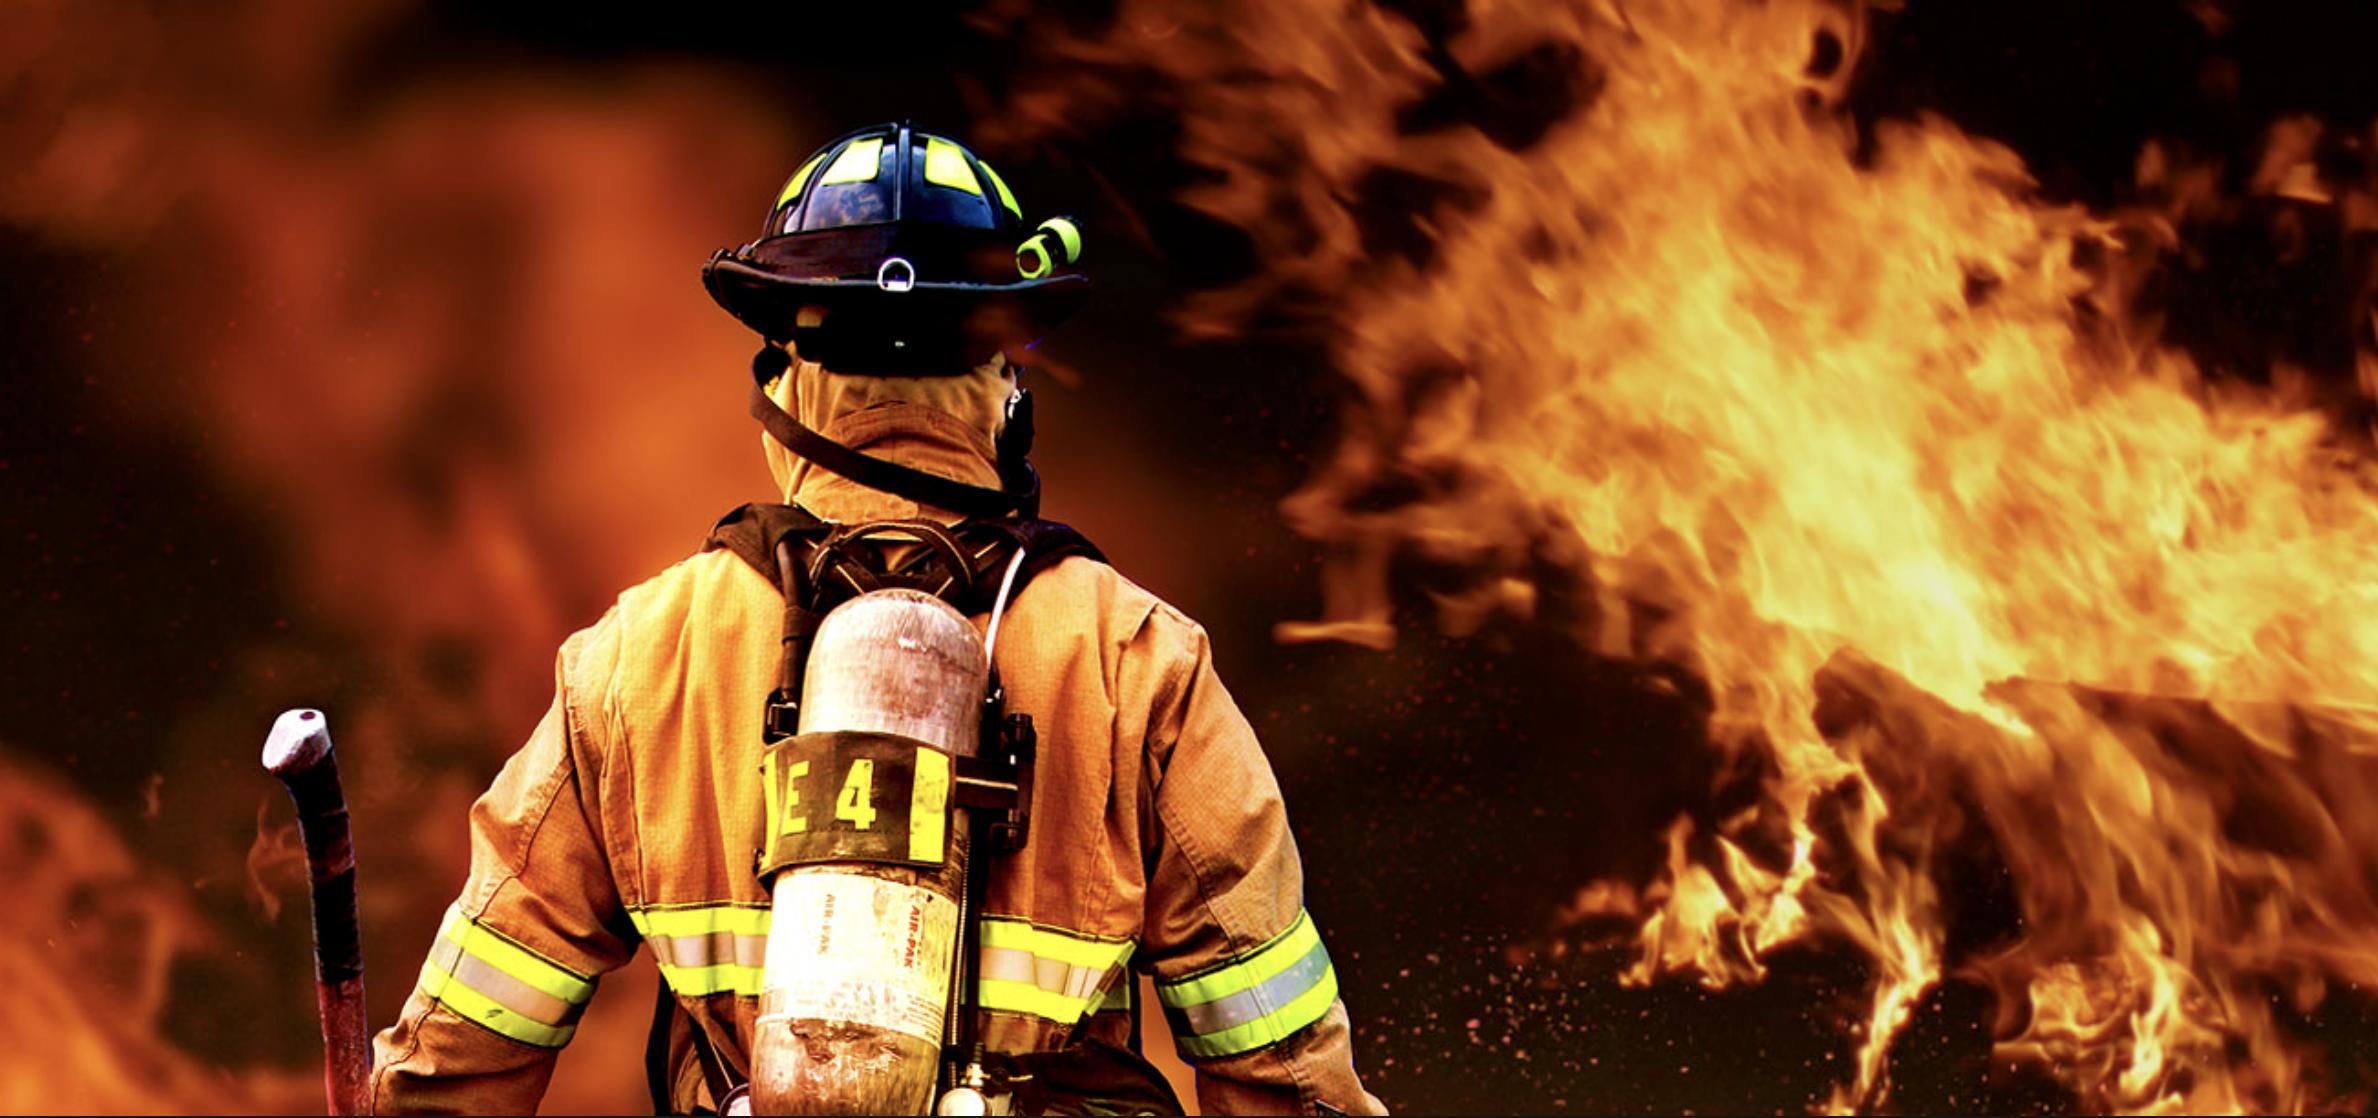 Fire & Medic -